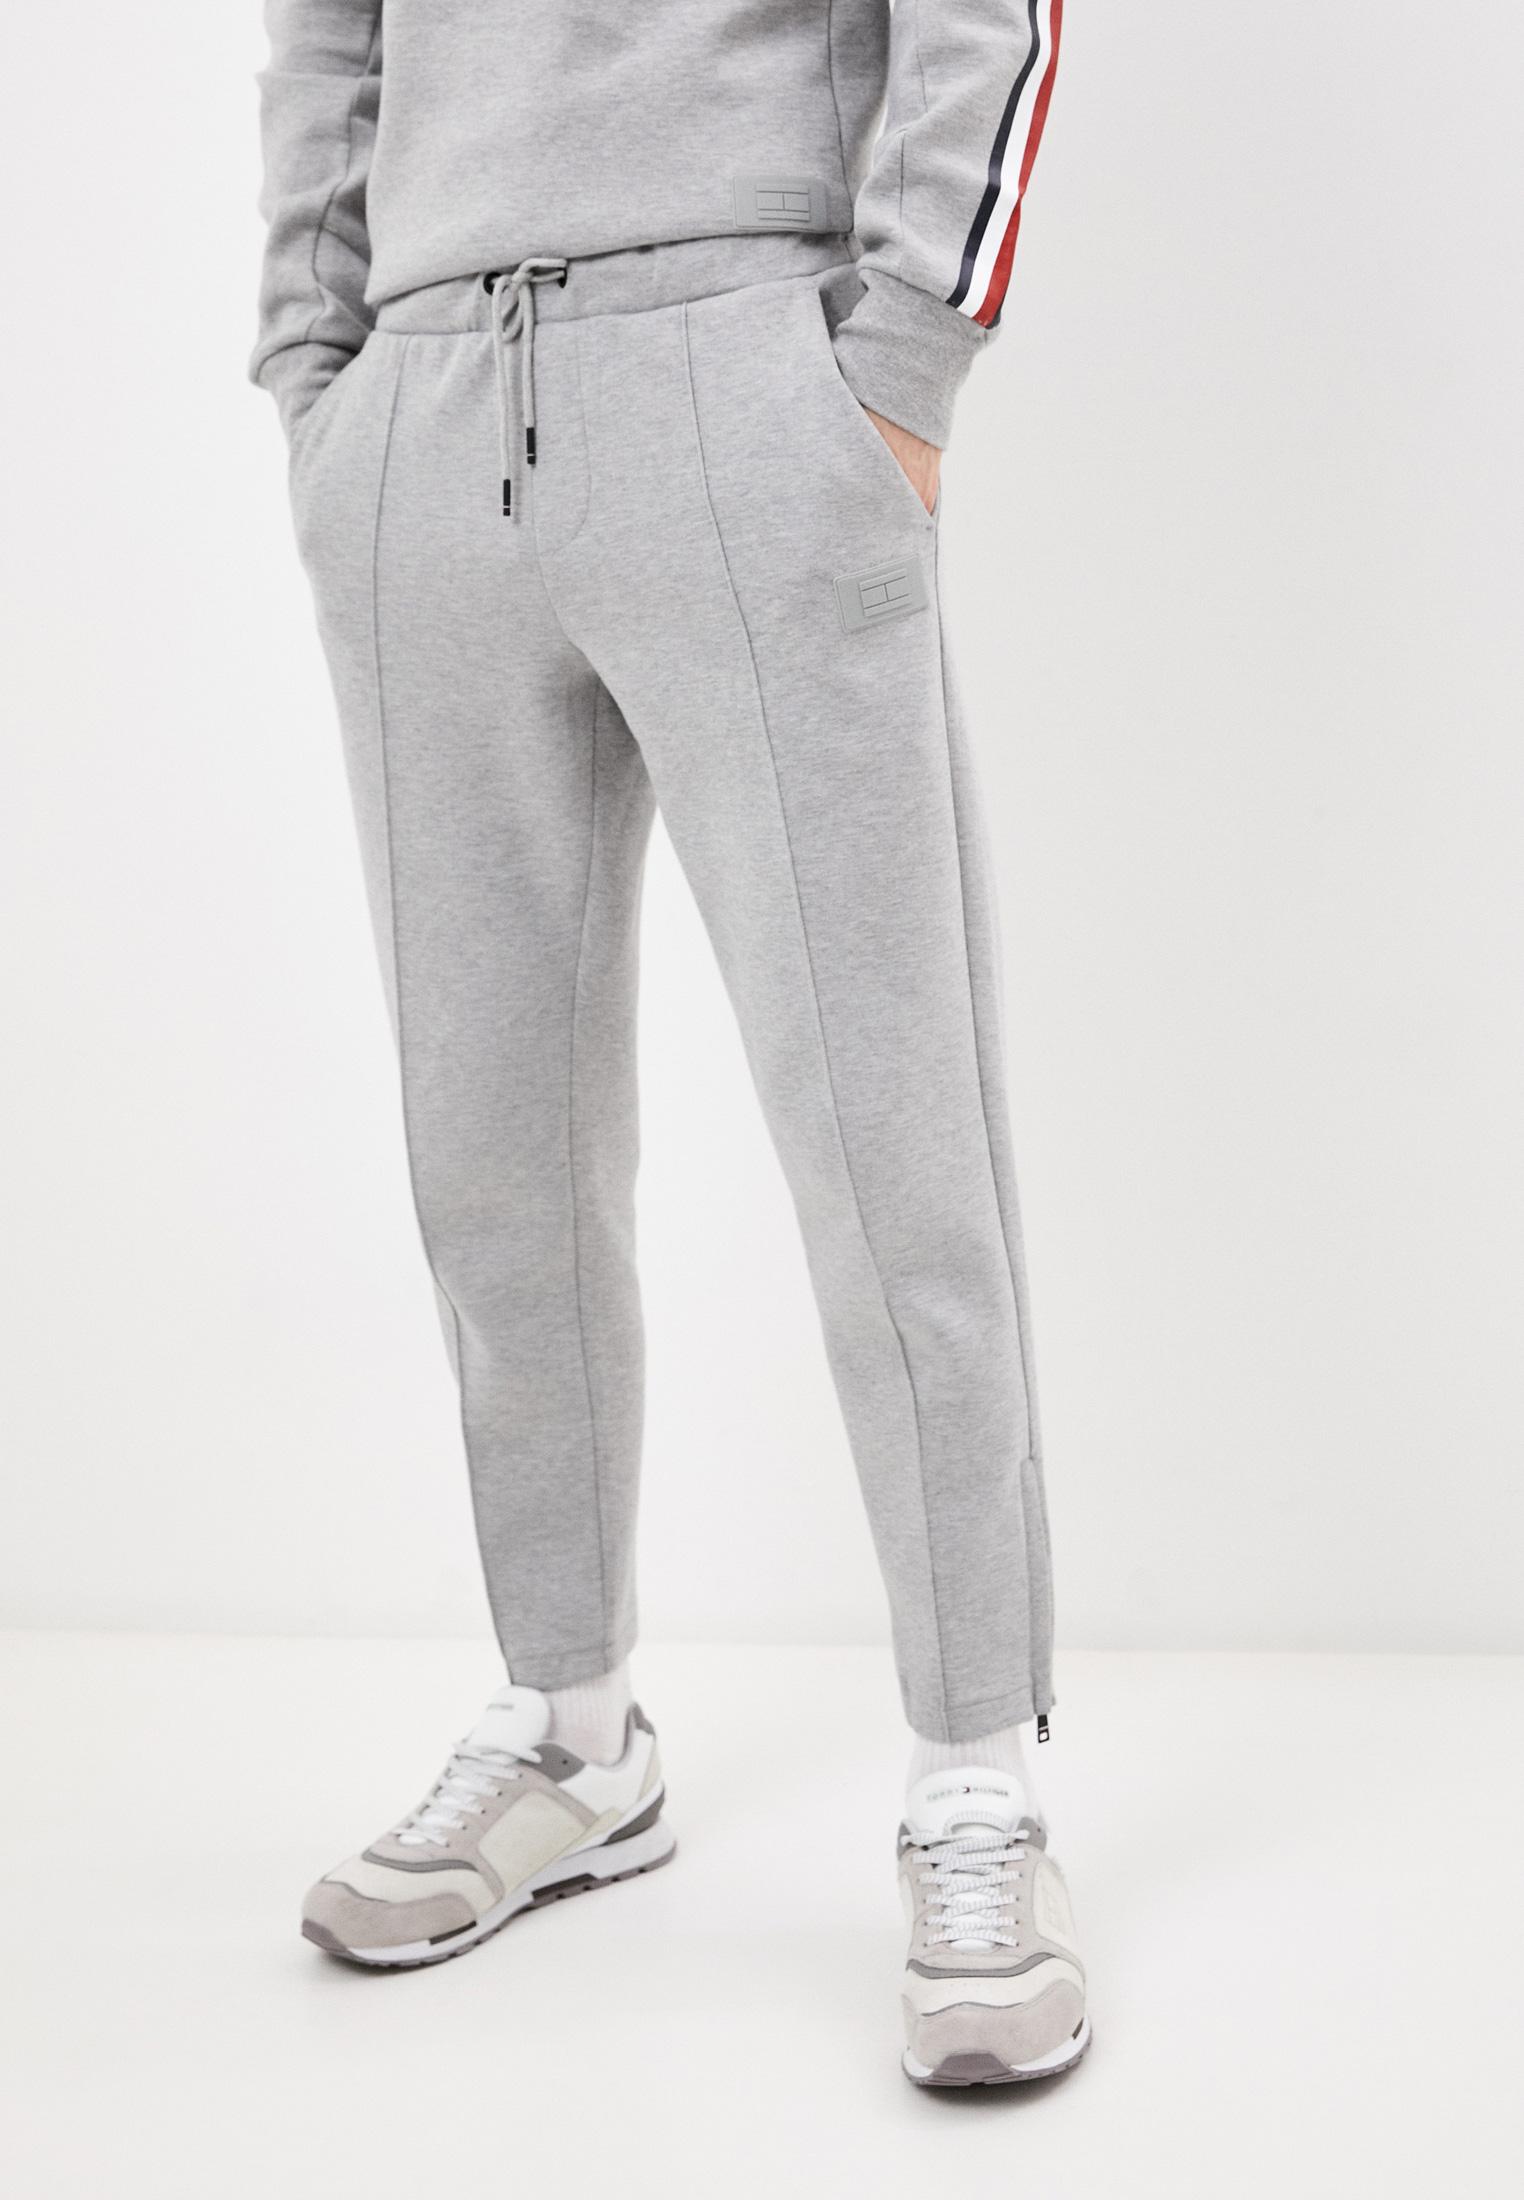 Мужские спортивные брюки Tommy Hilfiger (Томми Хилфигер) MW0MW17892